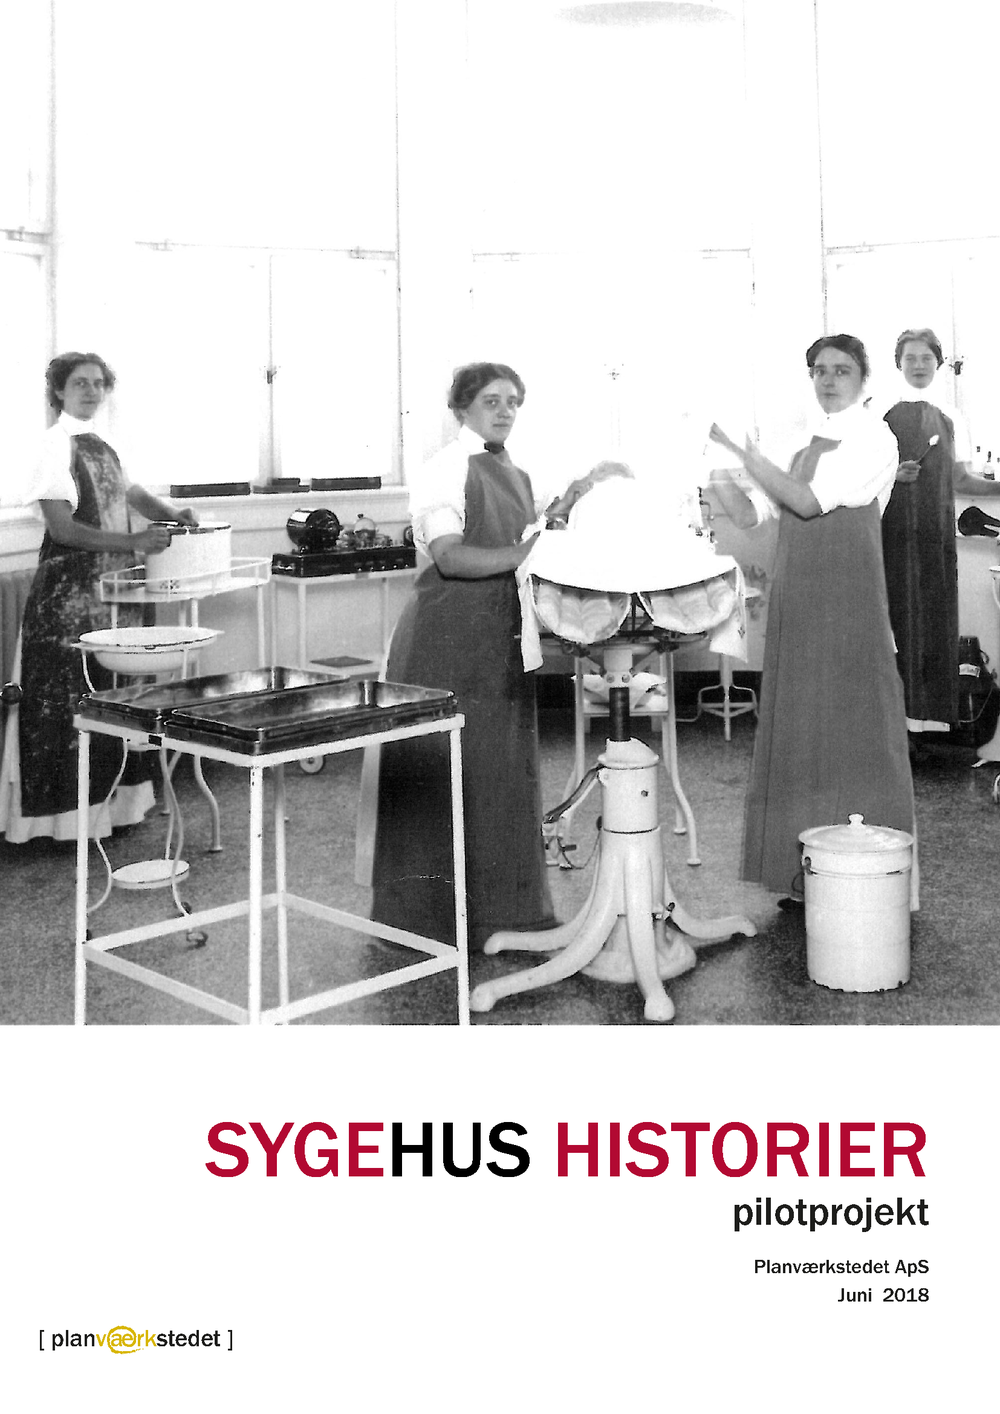 SYGEHUS HISTORIE.png